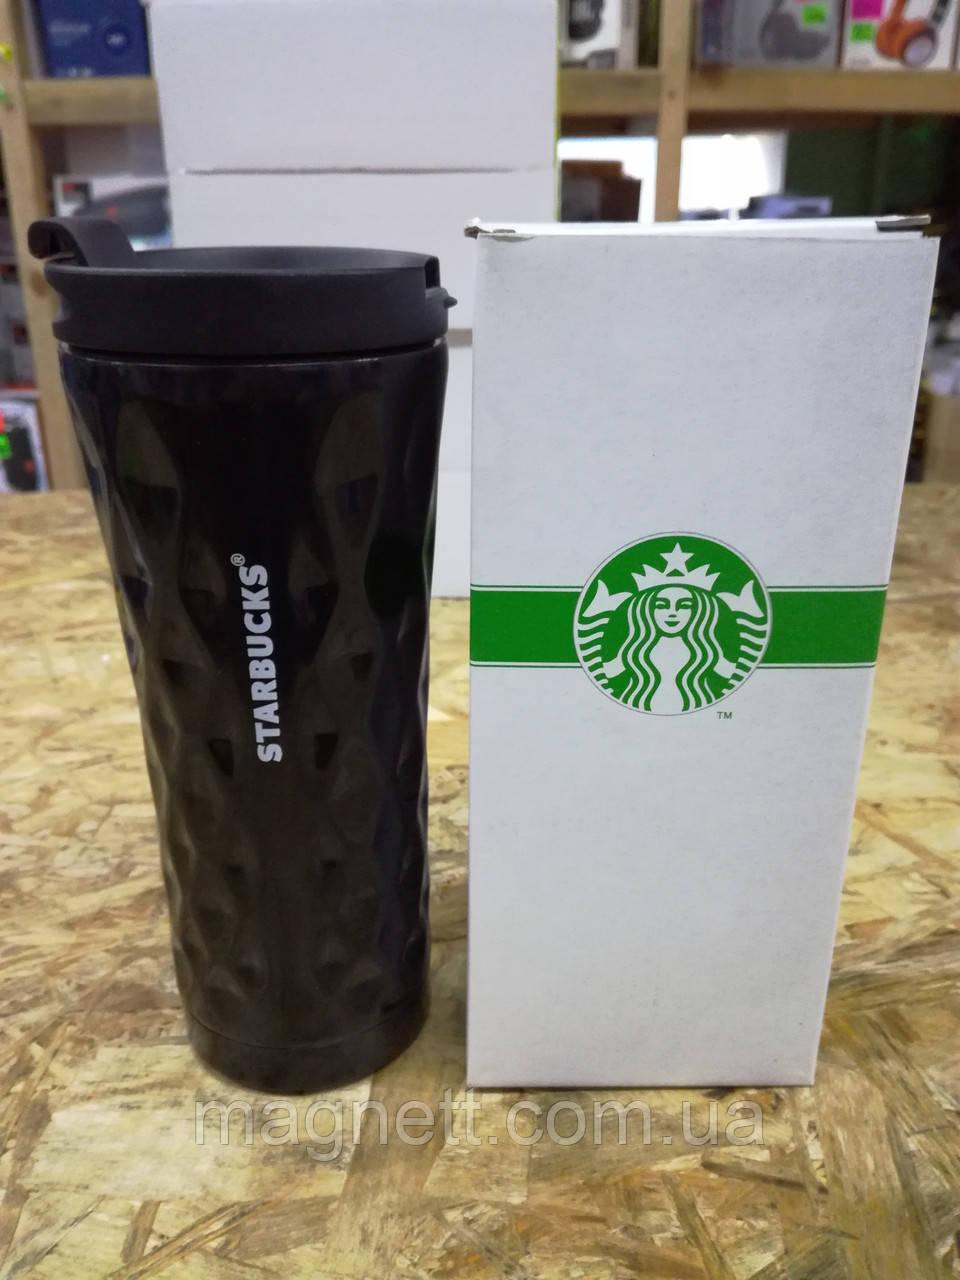 Термо чашка Starbucks Старбакс фигурная черная 500 мл